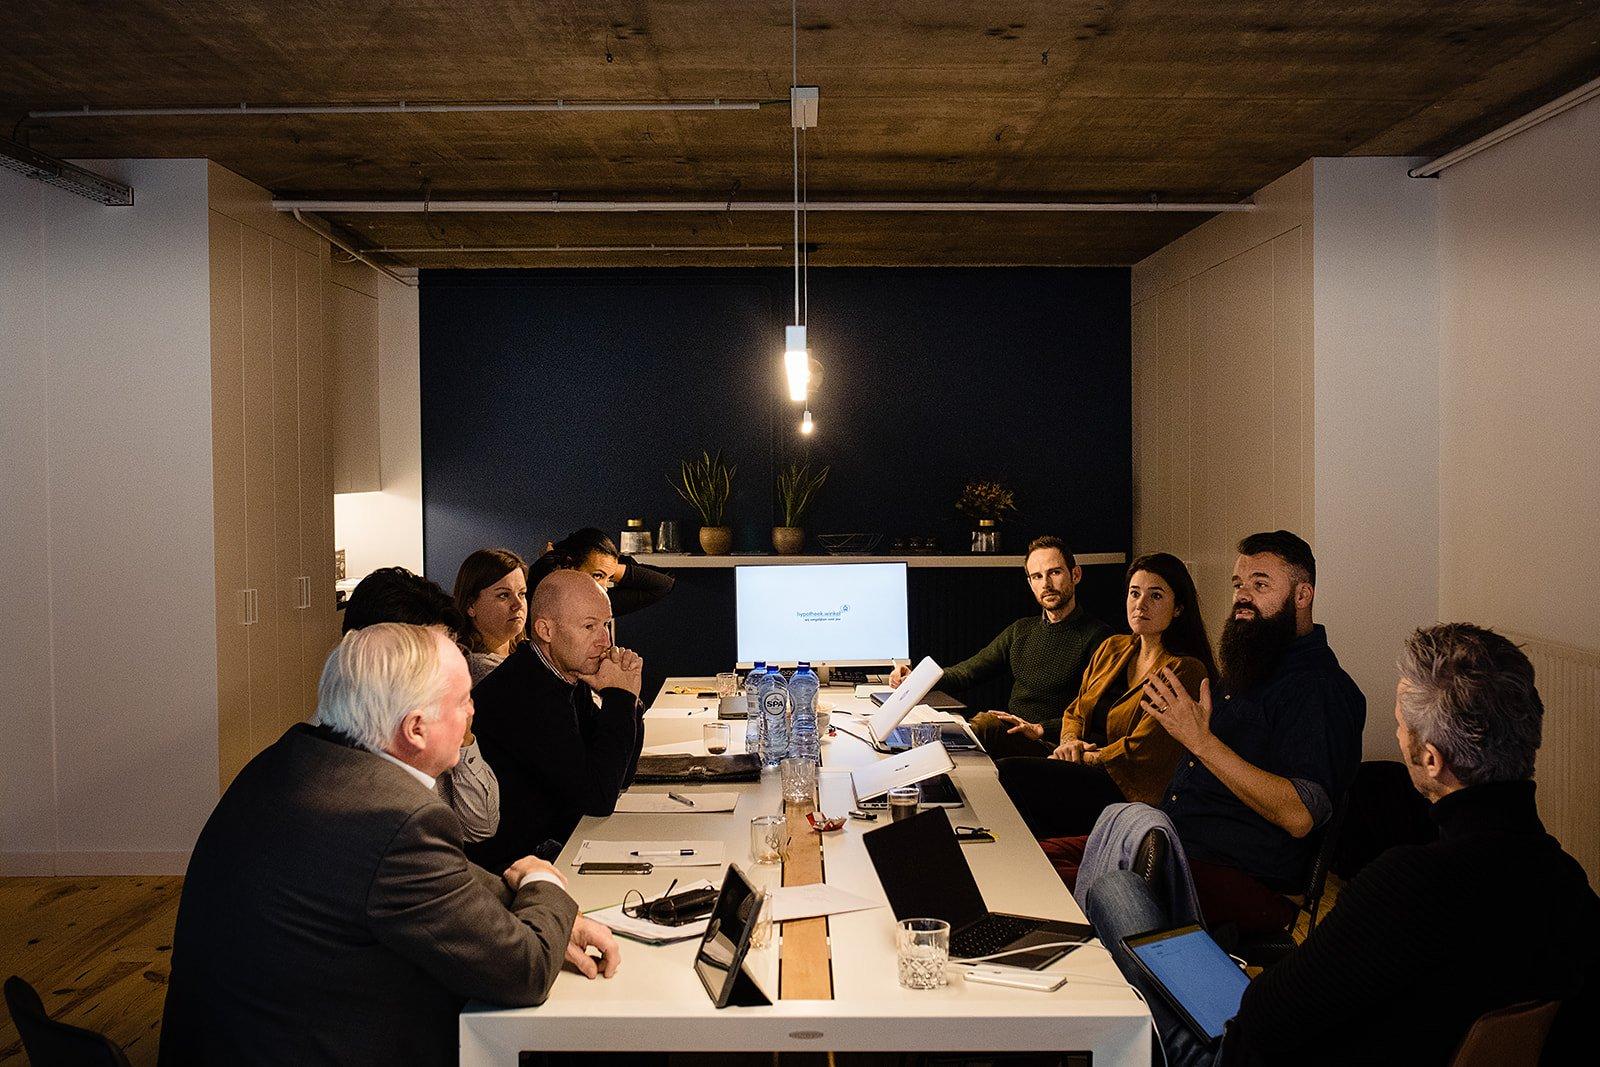 Hypotheekwinkel team meeting at the office